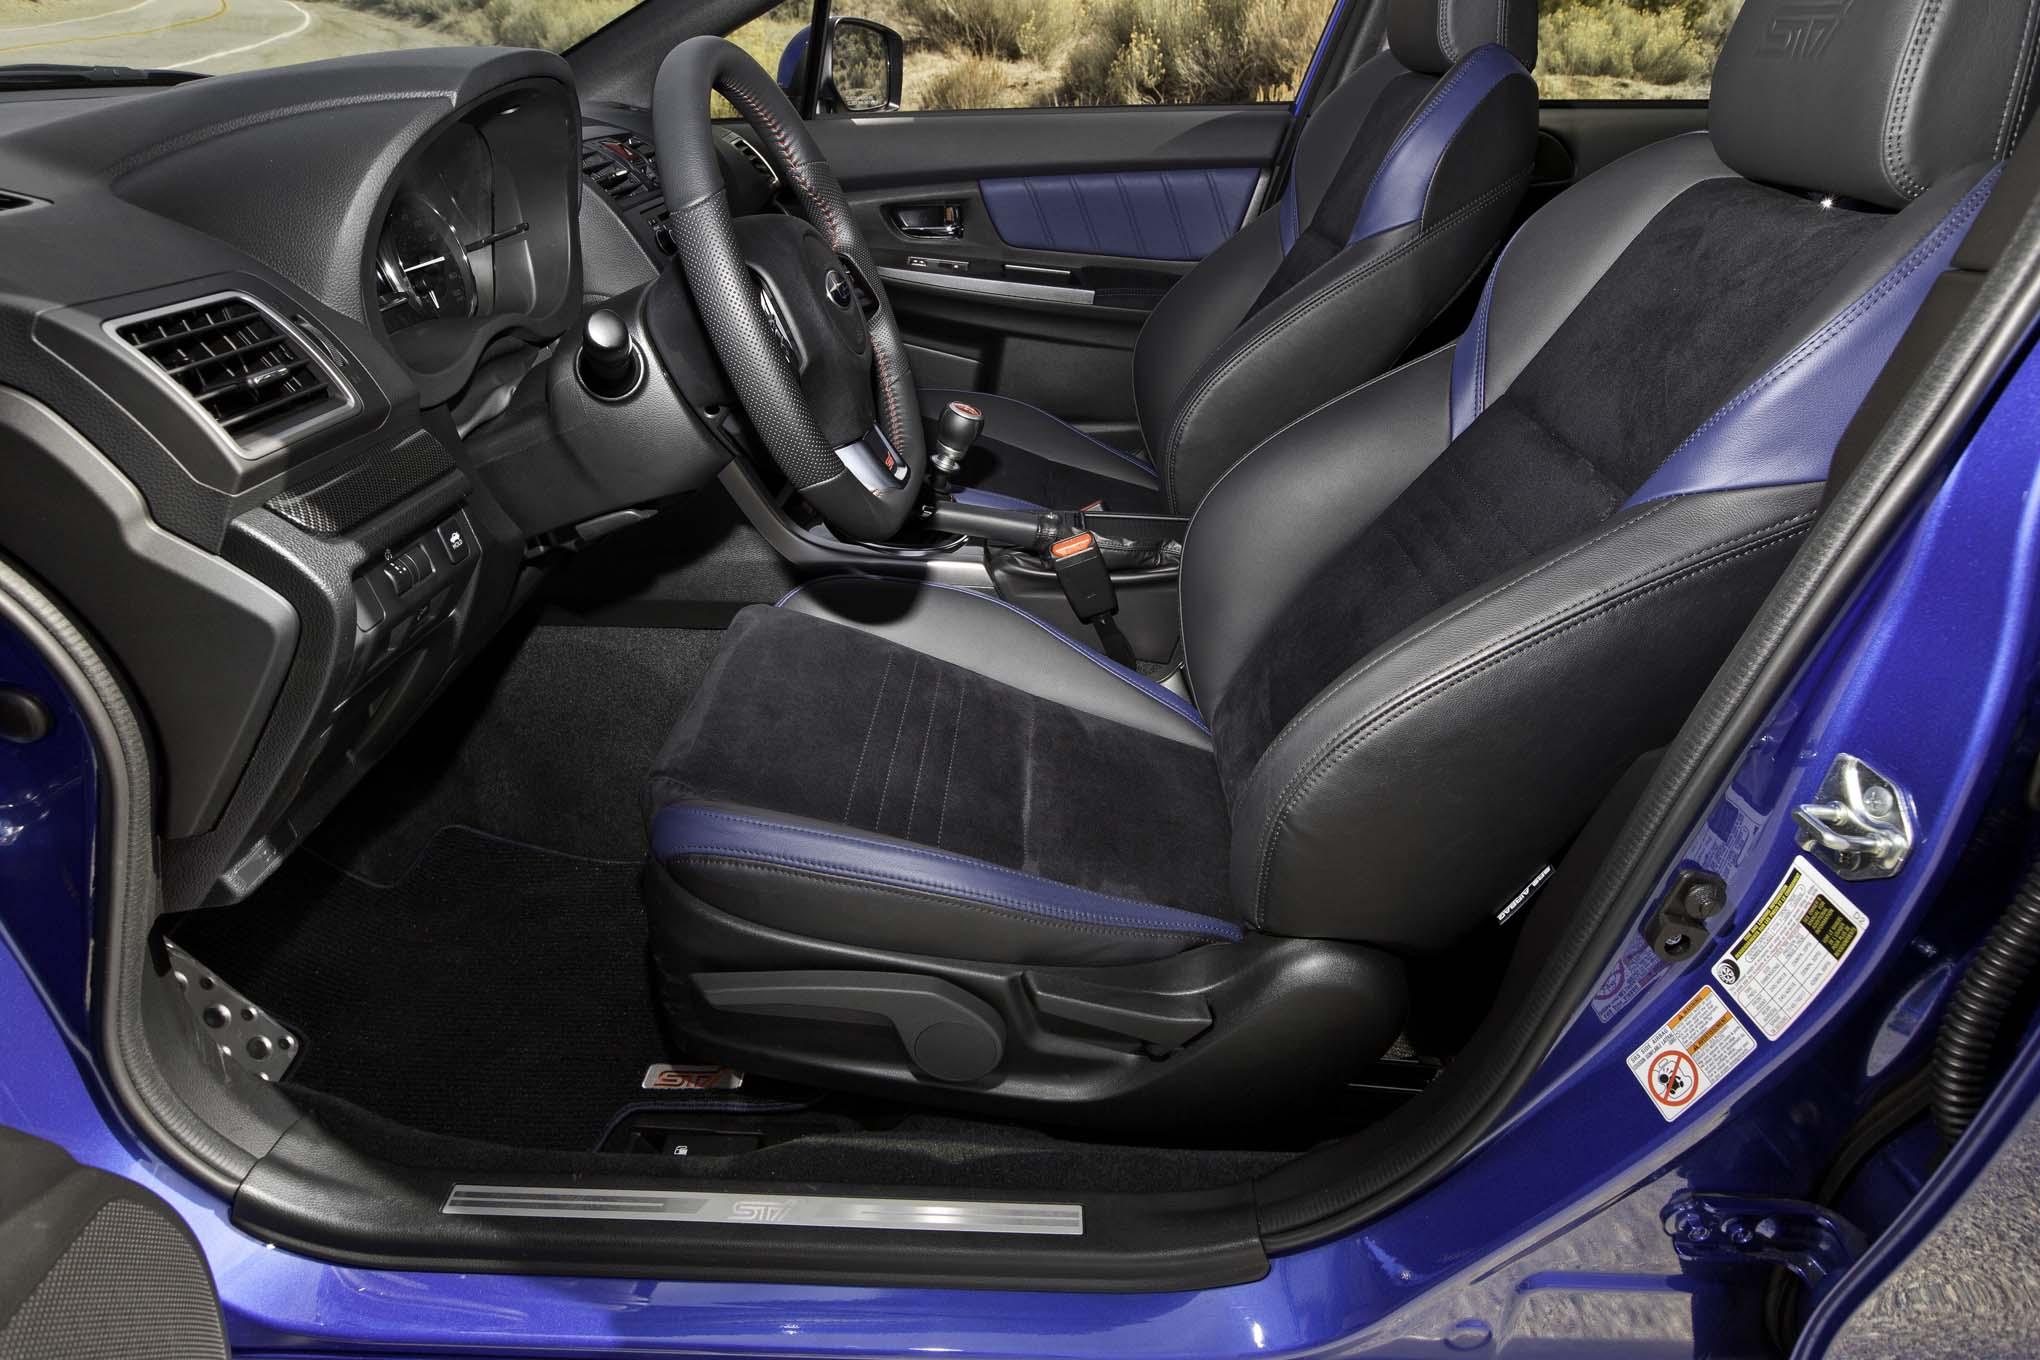 2015 Subaru WRX-STI Front Seats Interior